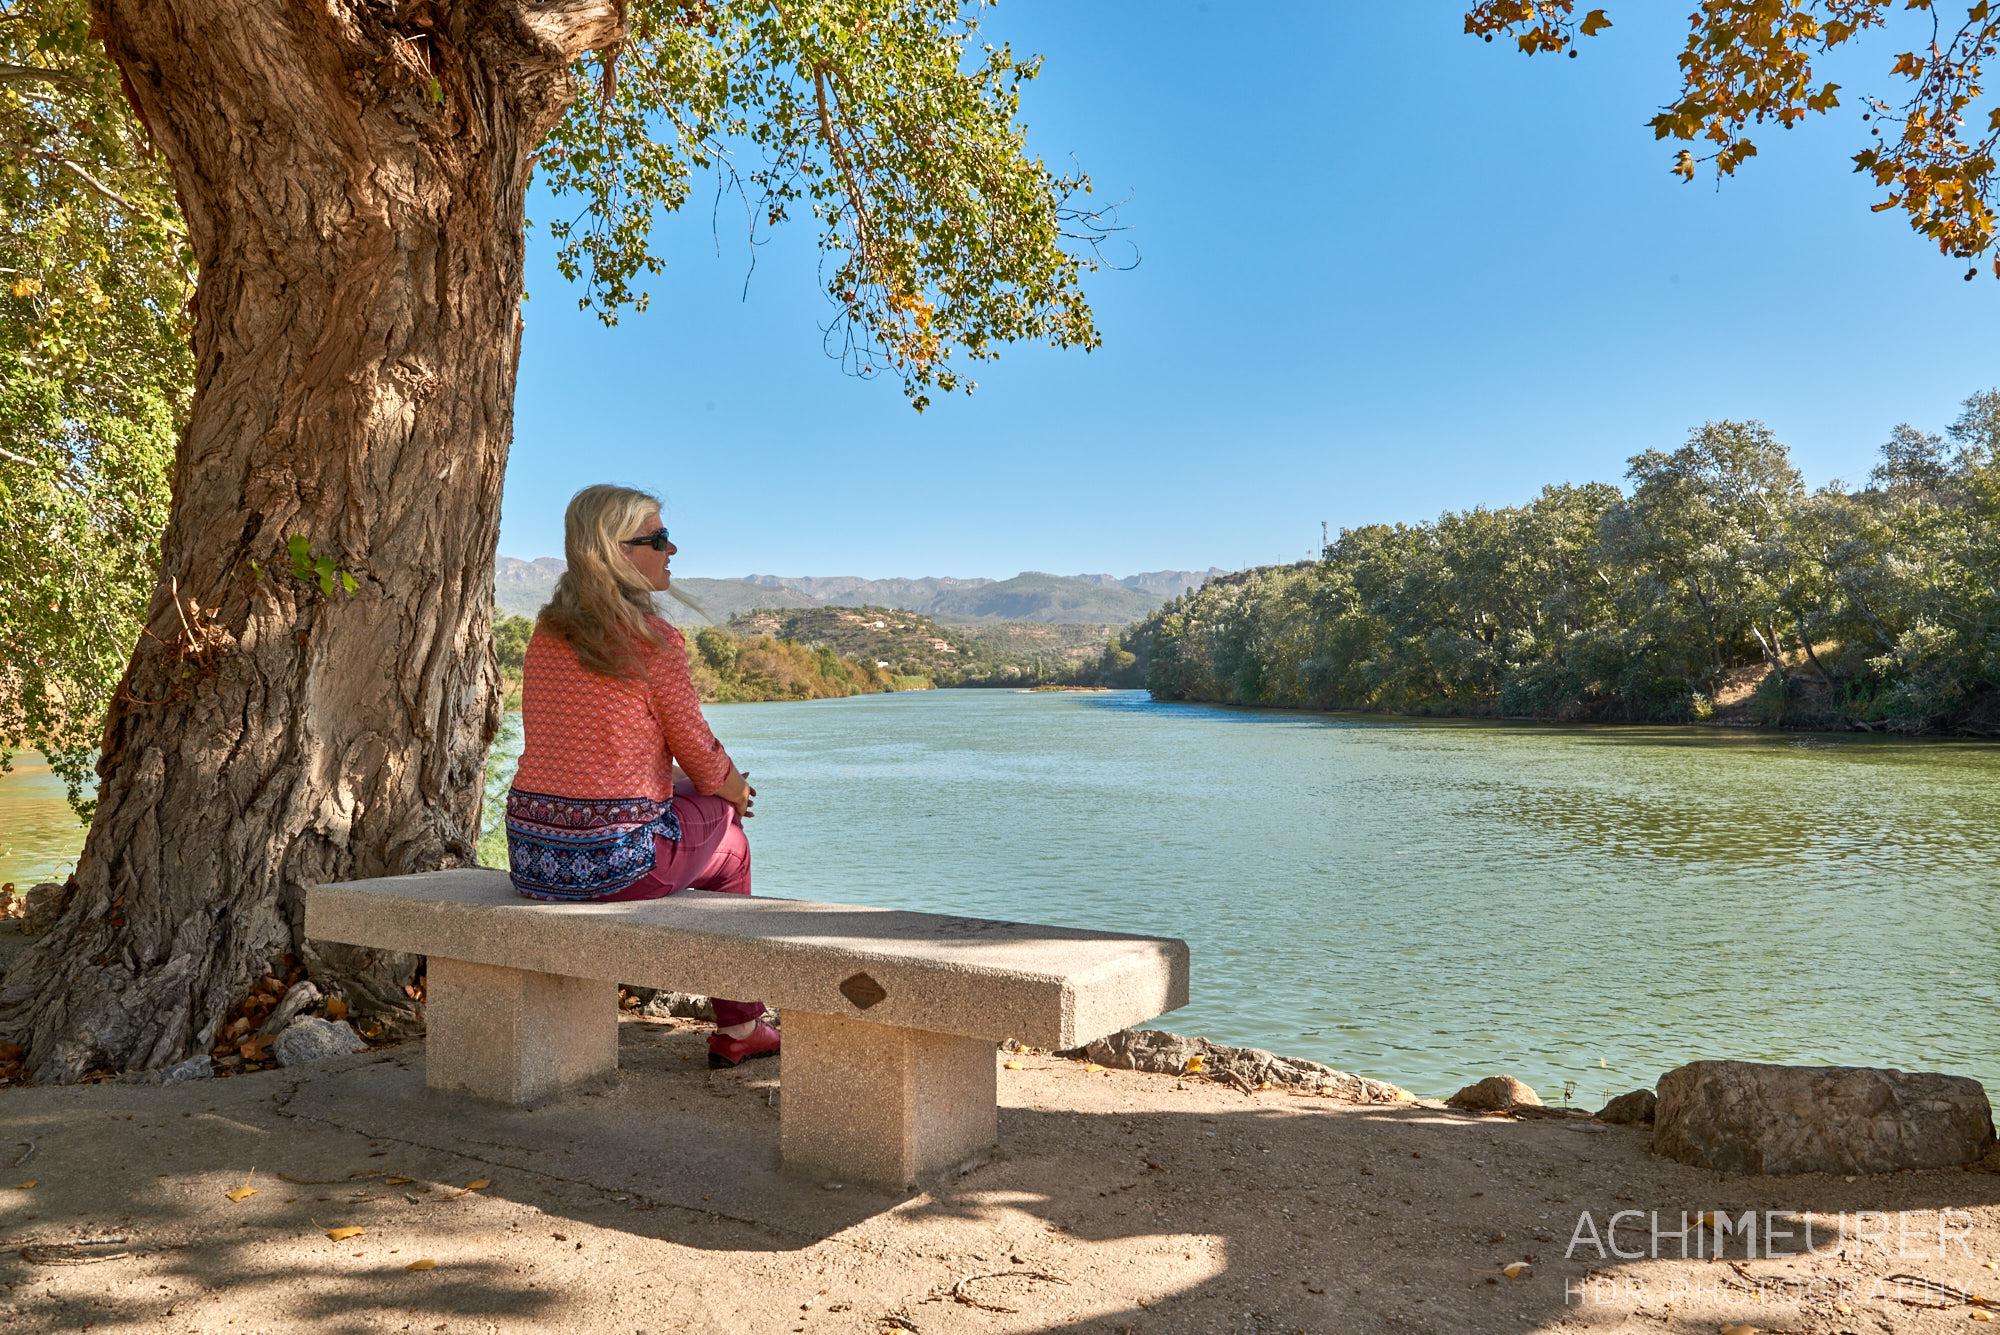 Am Flussufer des Ebros in Xerta, Tortosa, Katalonien, Spanien by AchimMeurer.com .